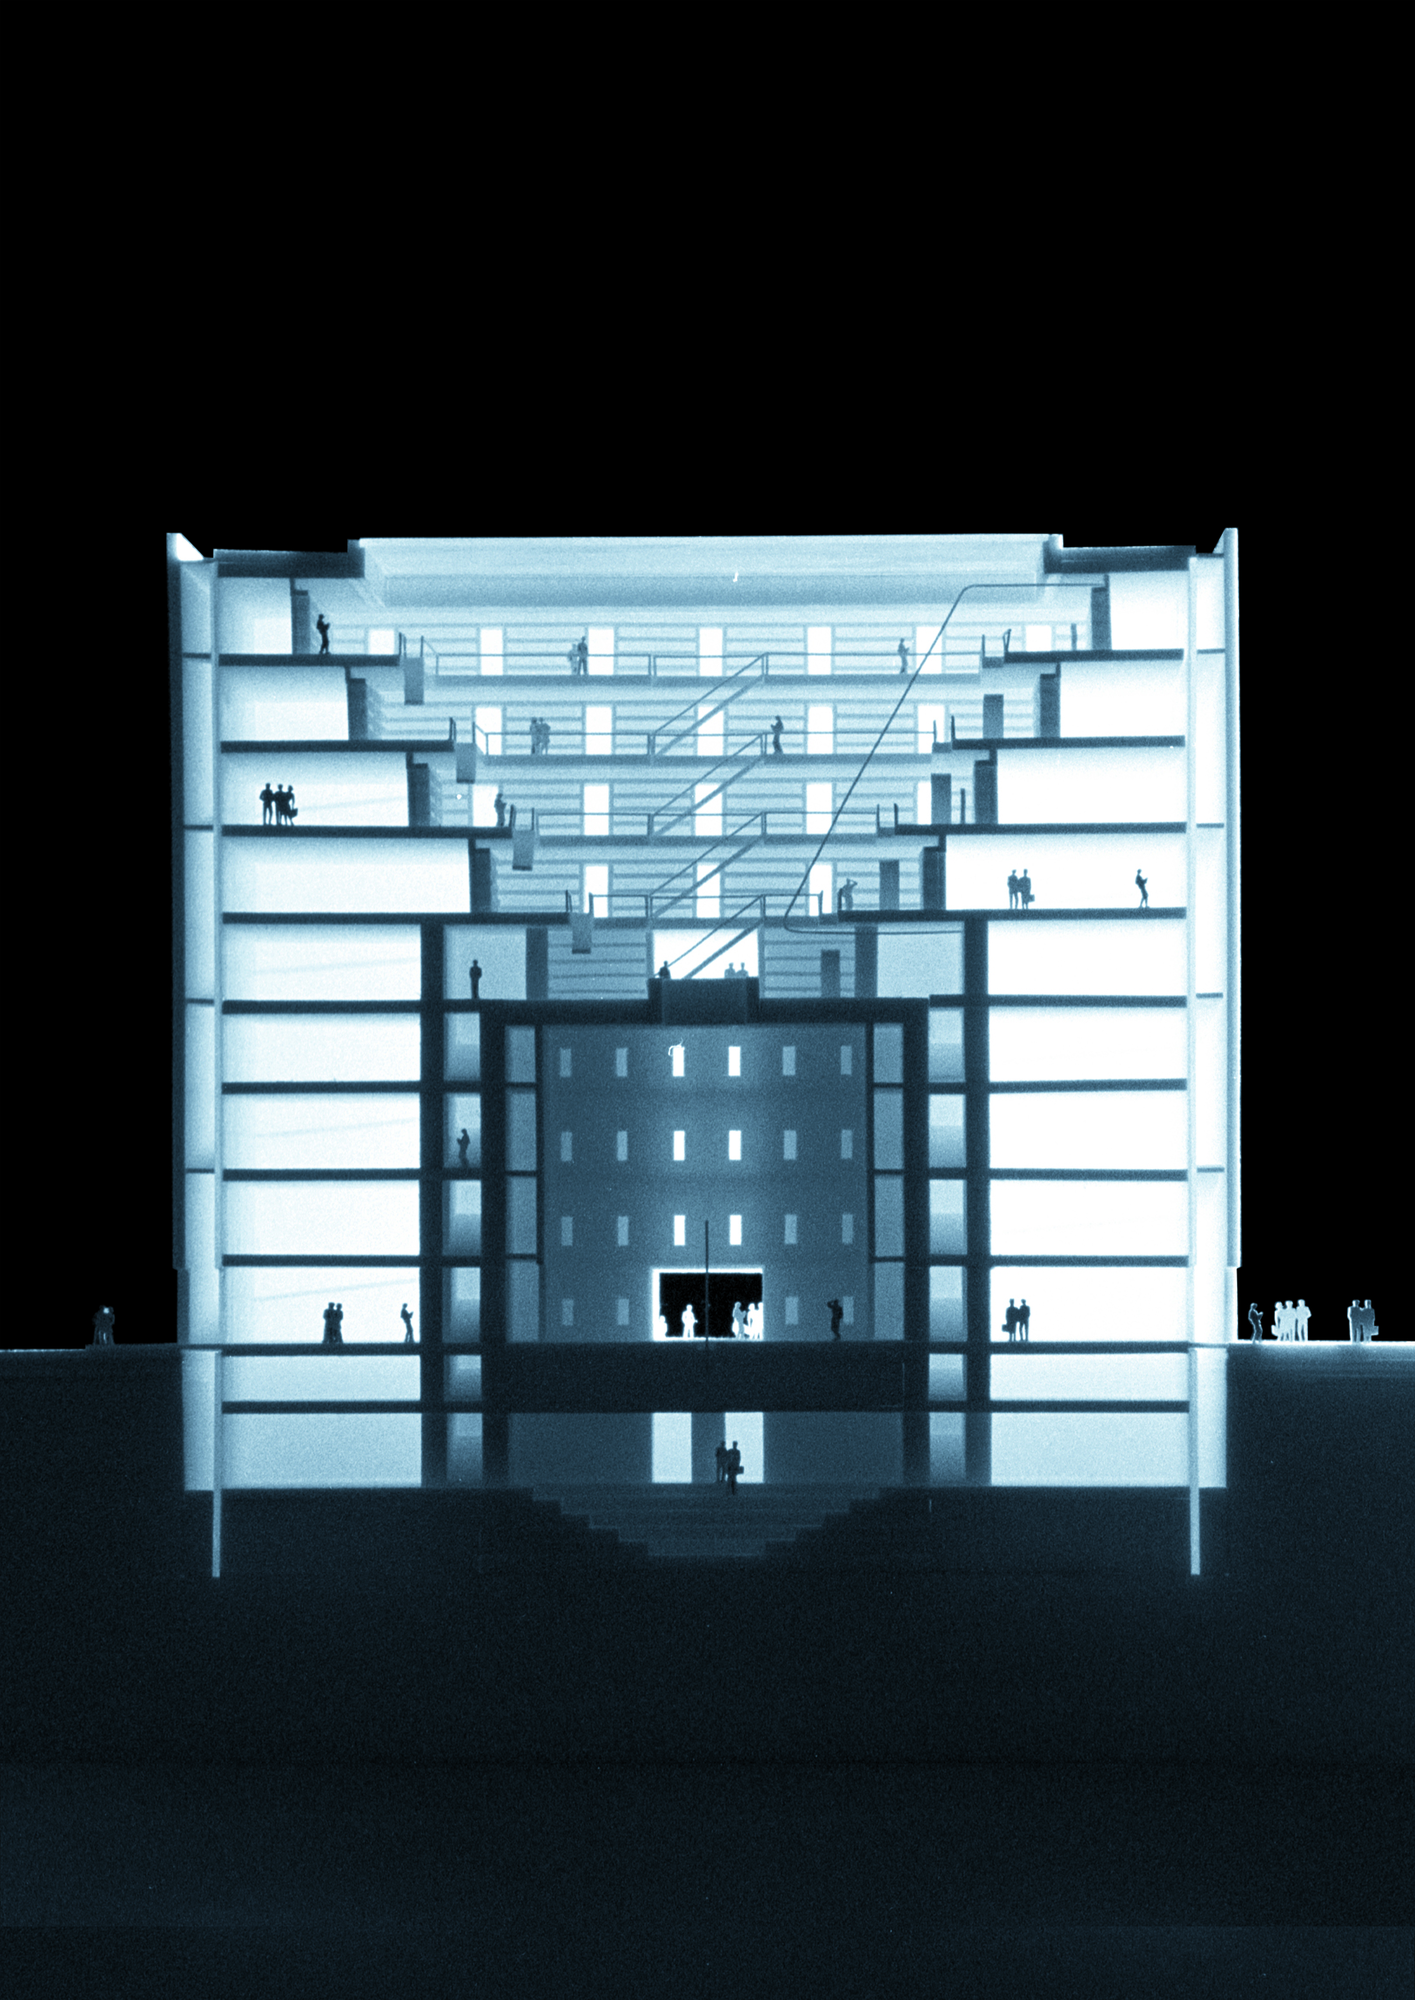 Architects Stuttgart stuttgart city library yi architects archdaily